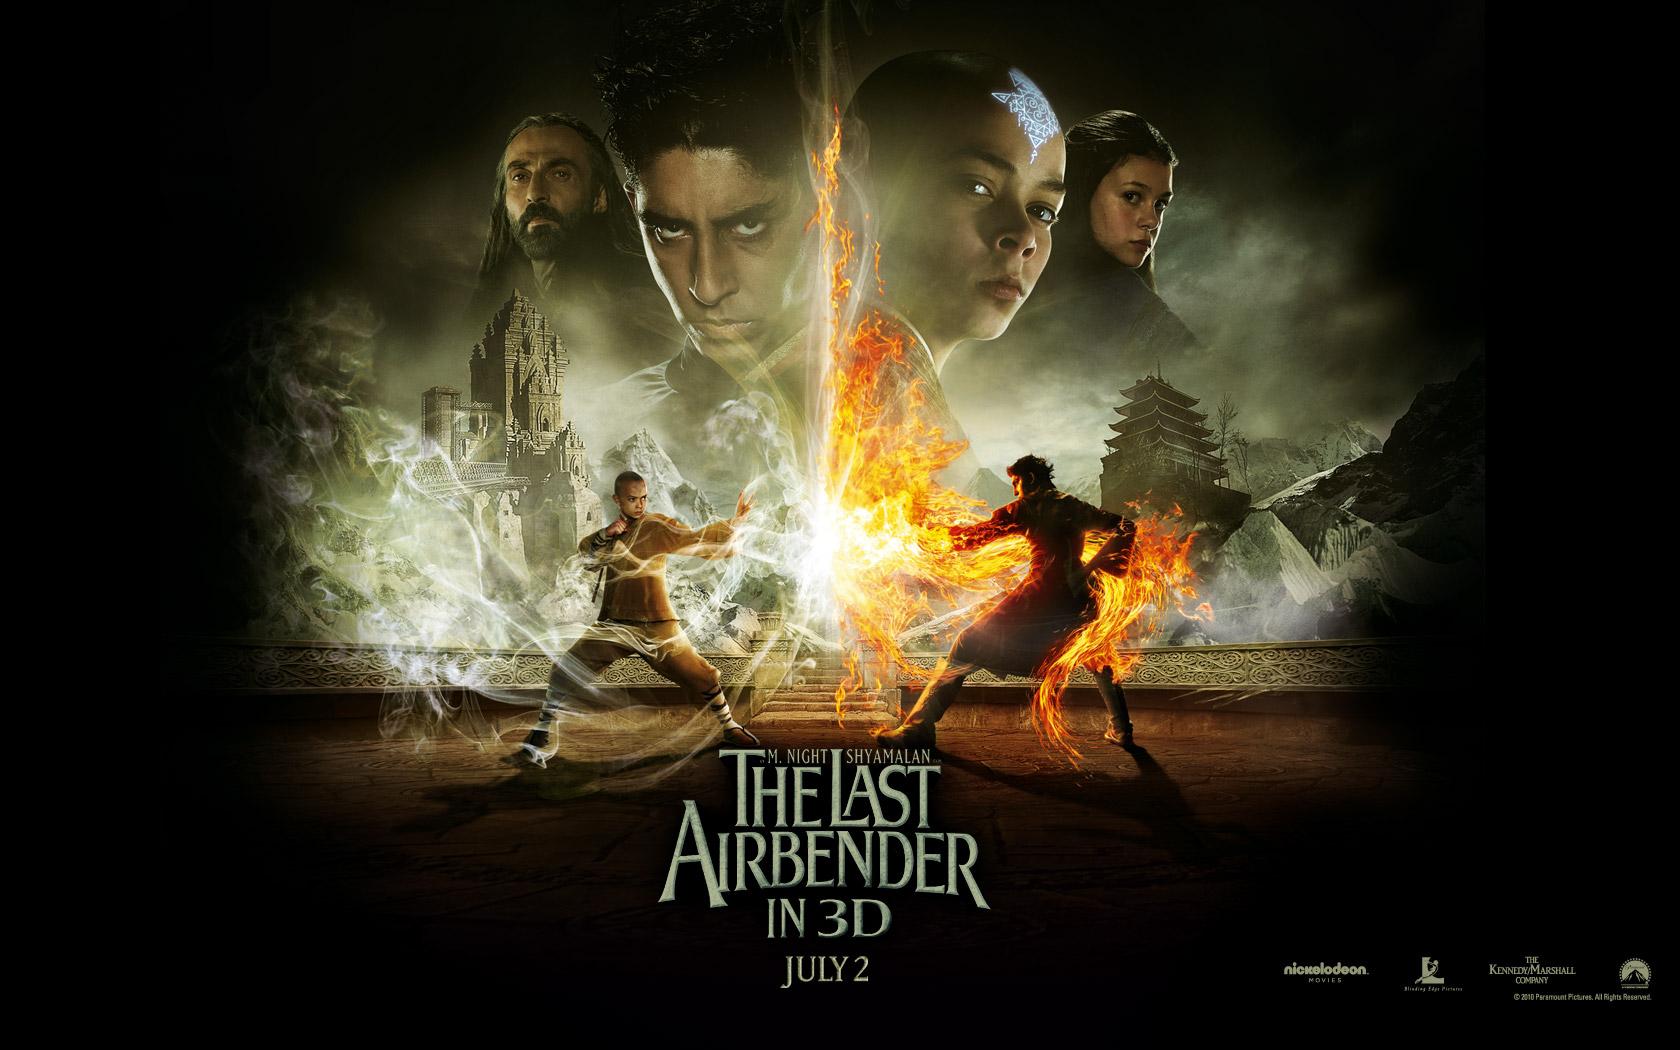 Avatar The Last Airbender Movie Wallpaper 1680 X 1050 Pixels